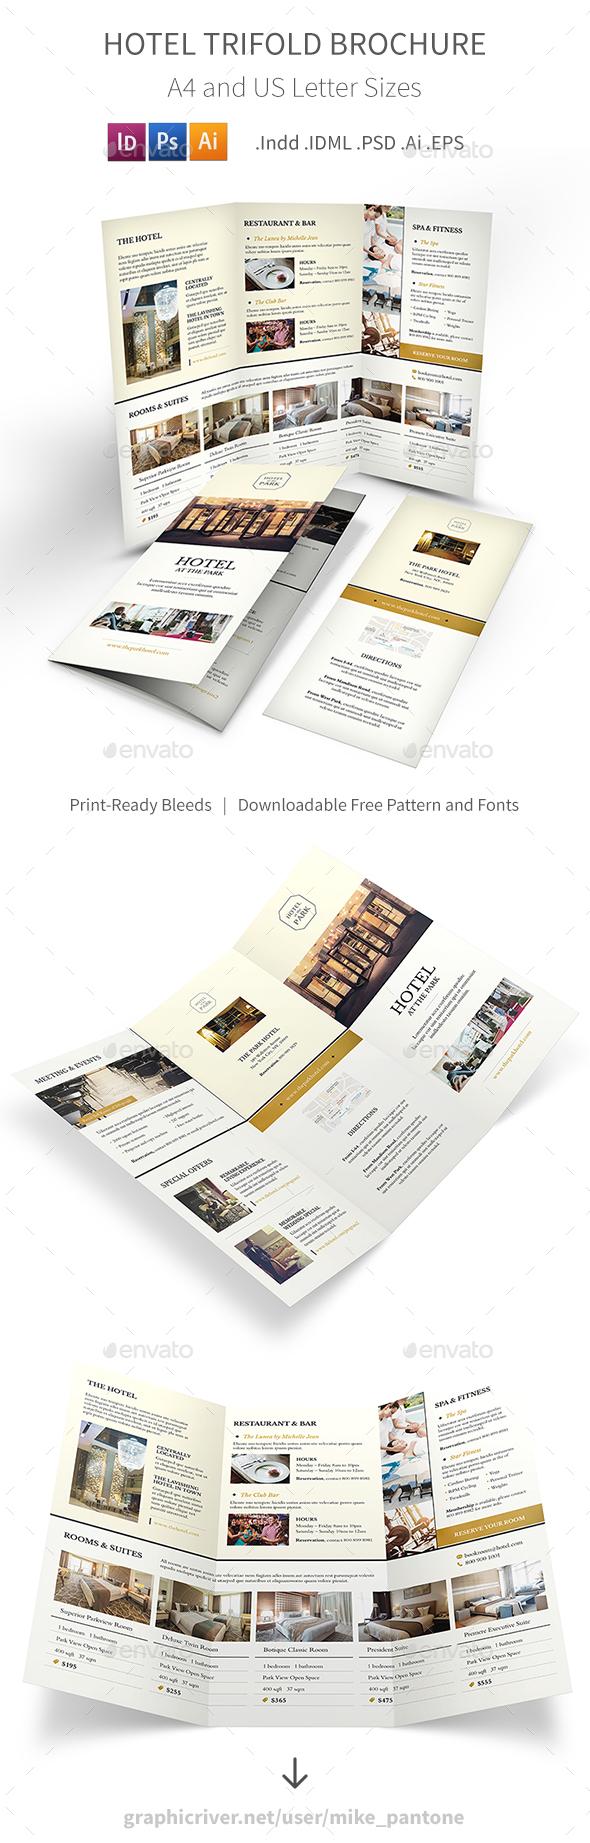 Hotel Trifold Brochure 6 - Informational Brochures